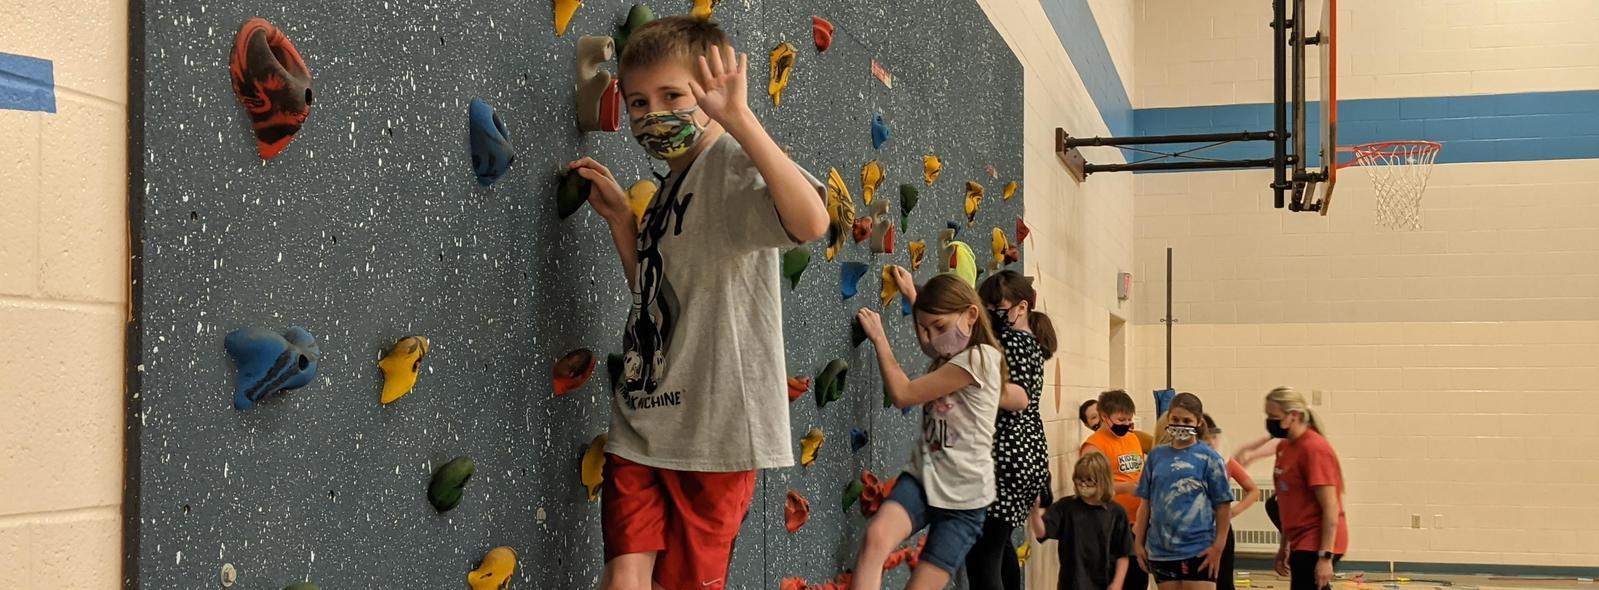 students climbing on rock wall